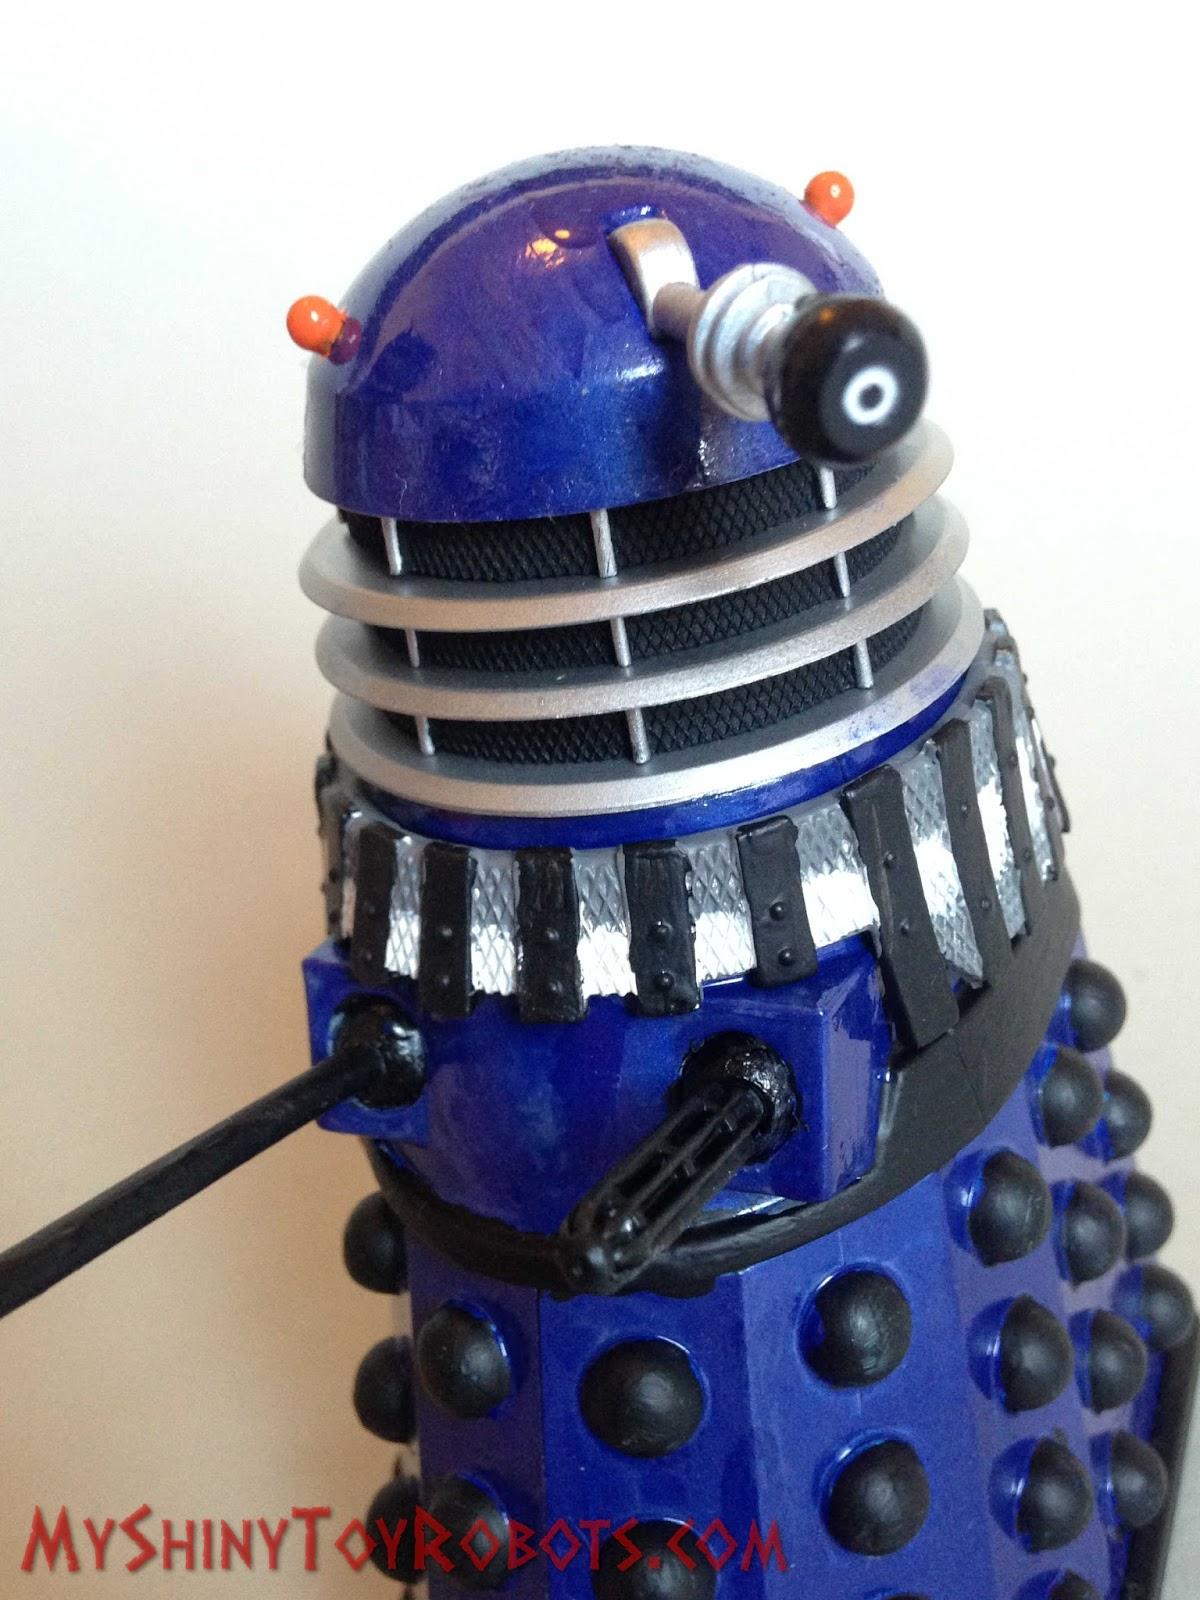 My Shiny Toy Robots Custom Figure Promotional Blue